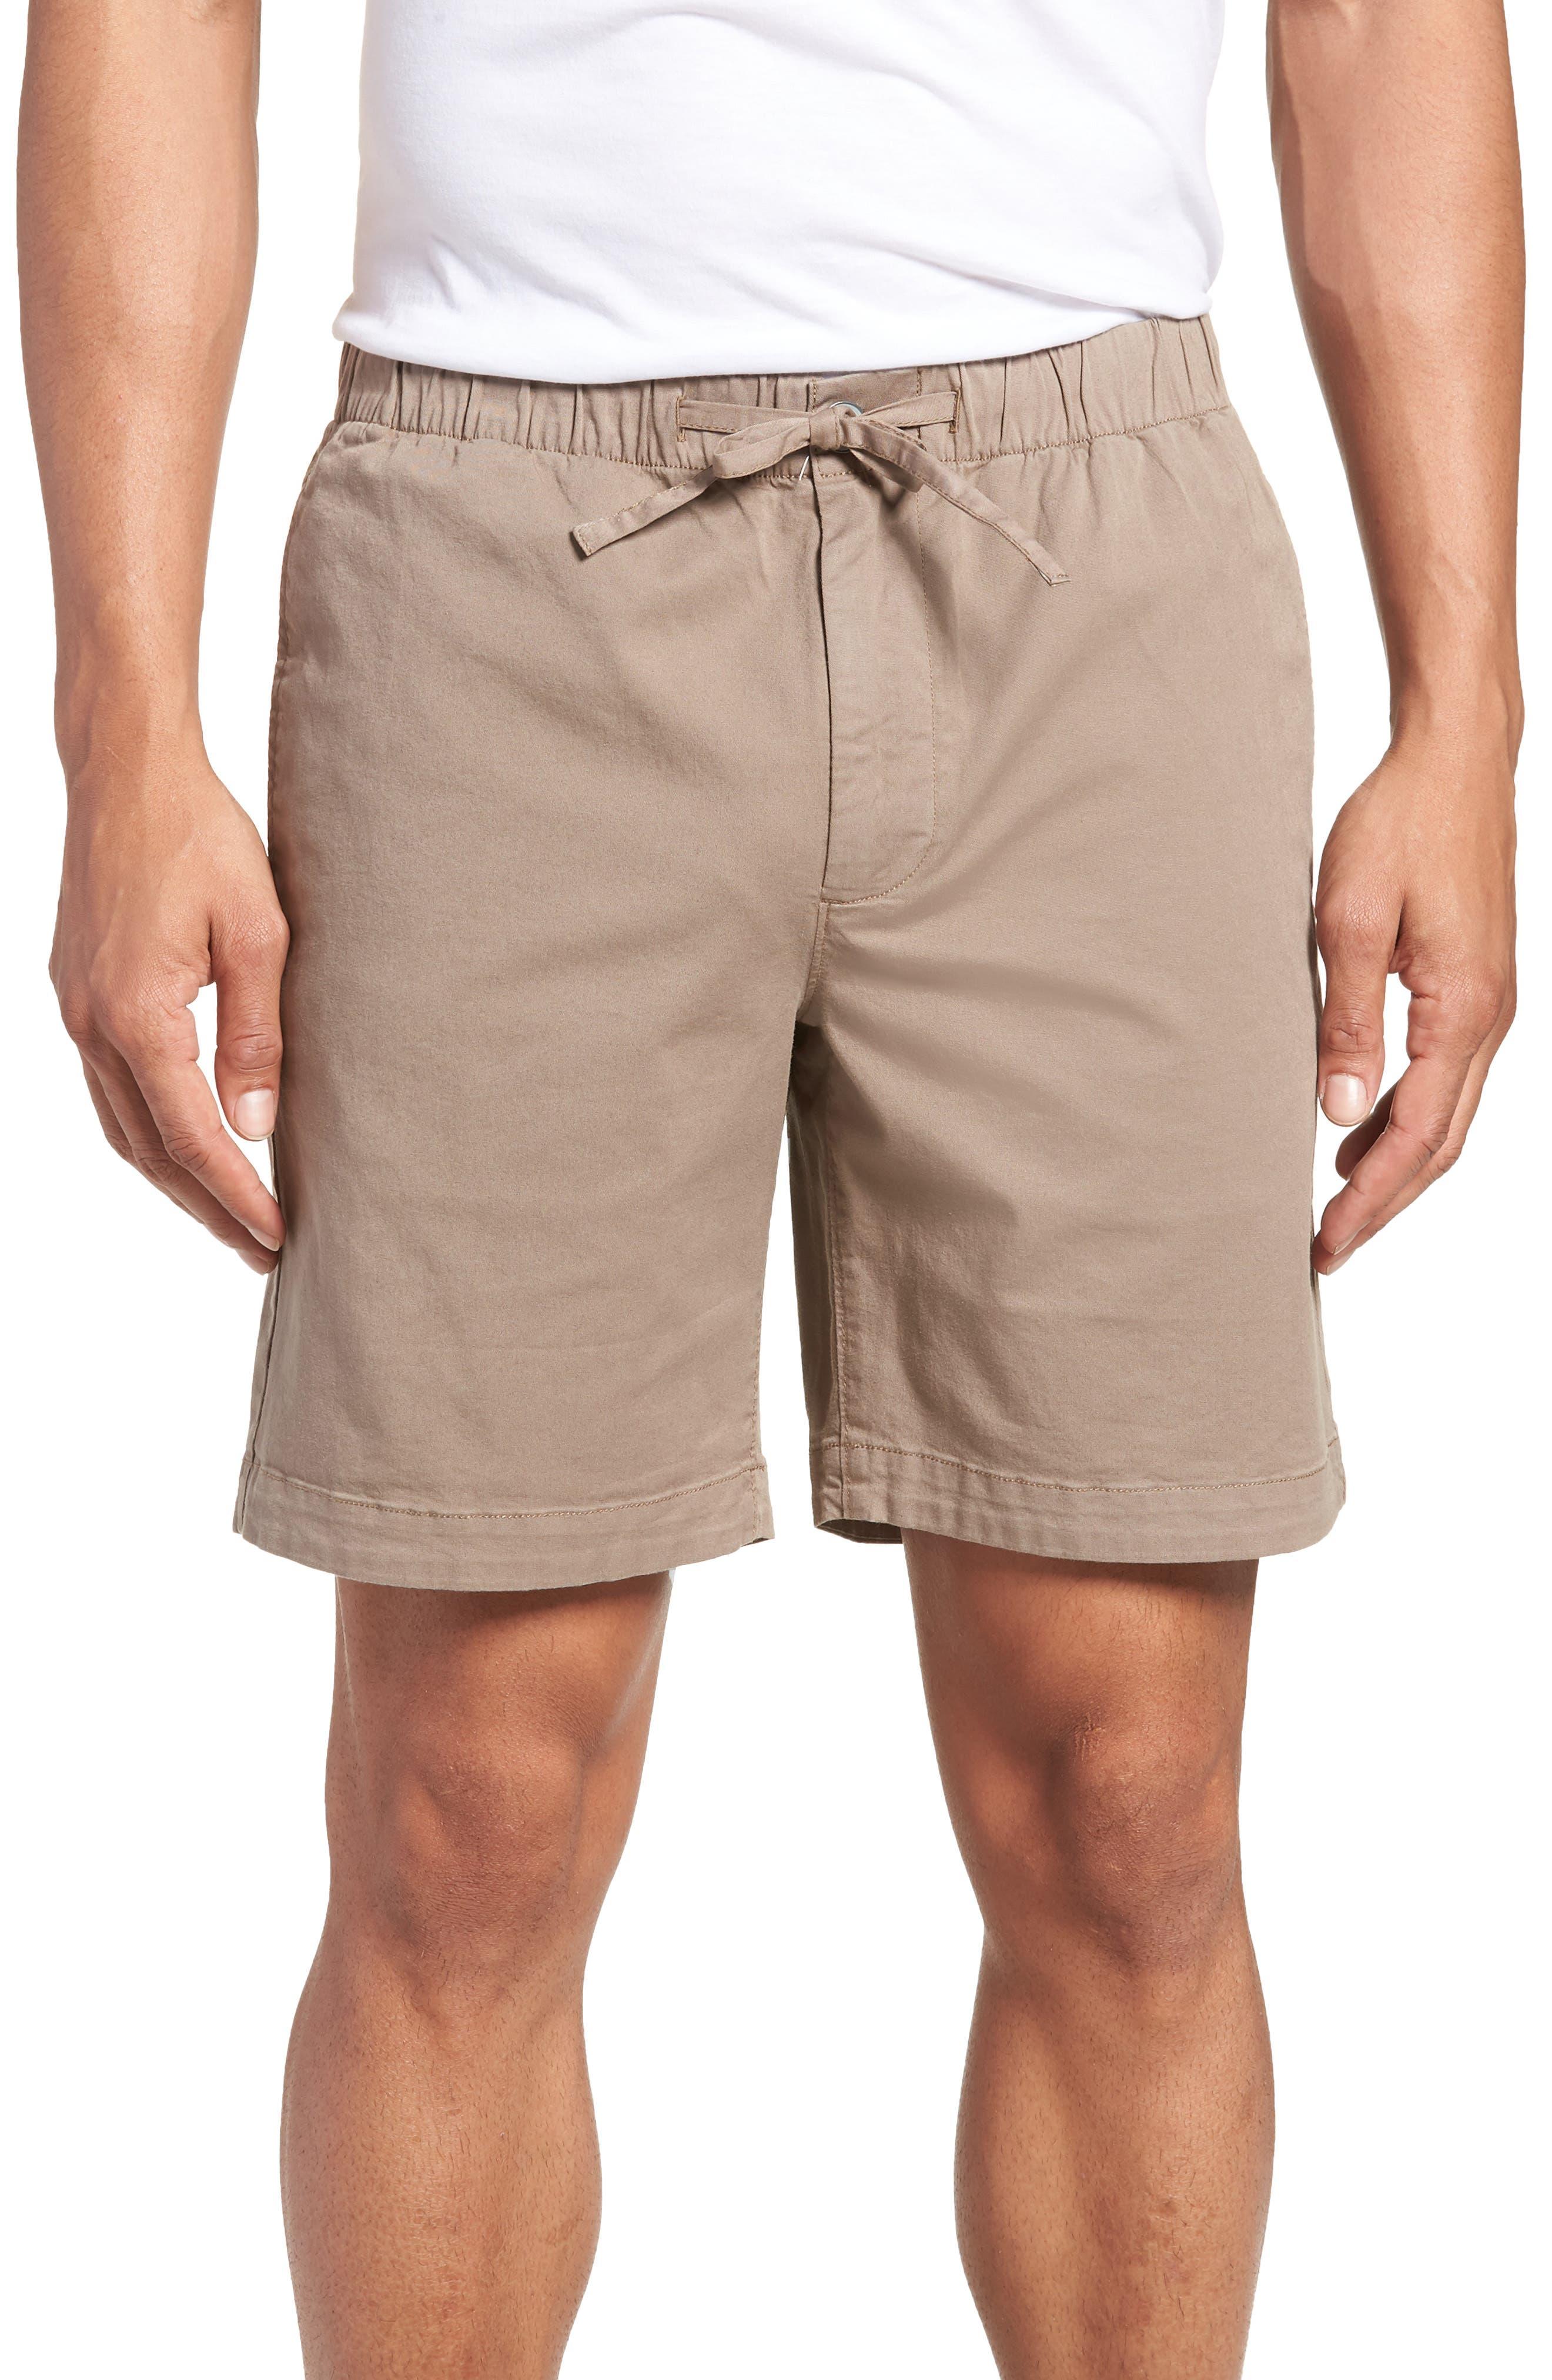 7-Inch Beach Shorts,                         Main,                         color, 200